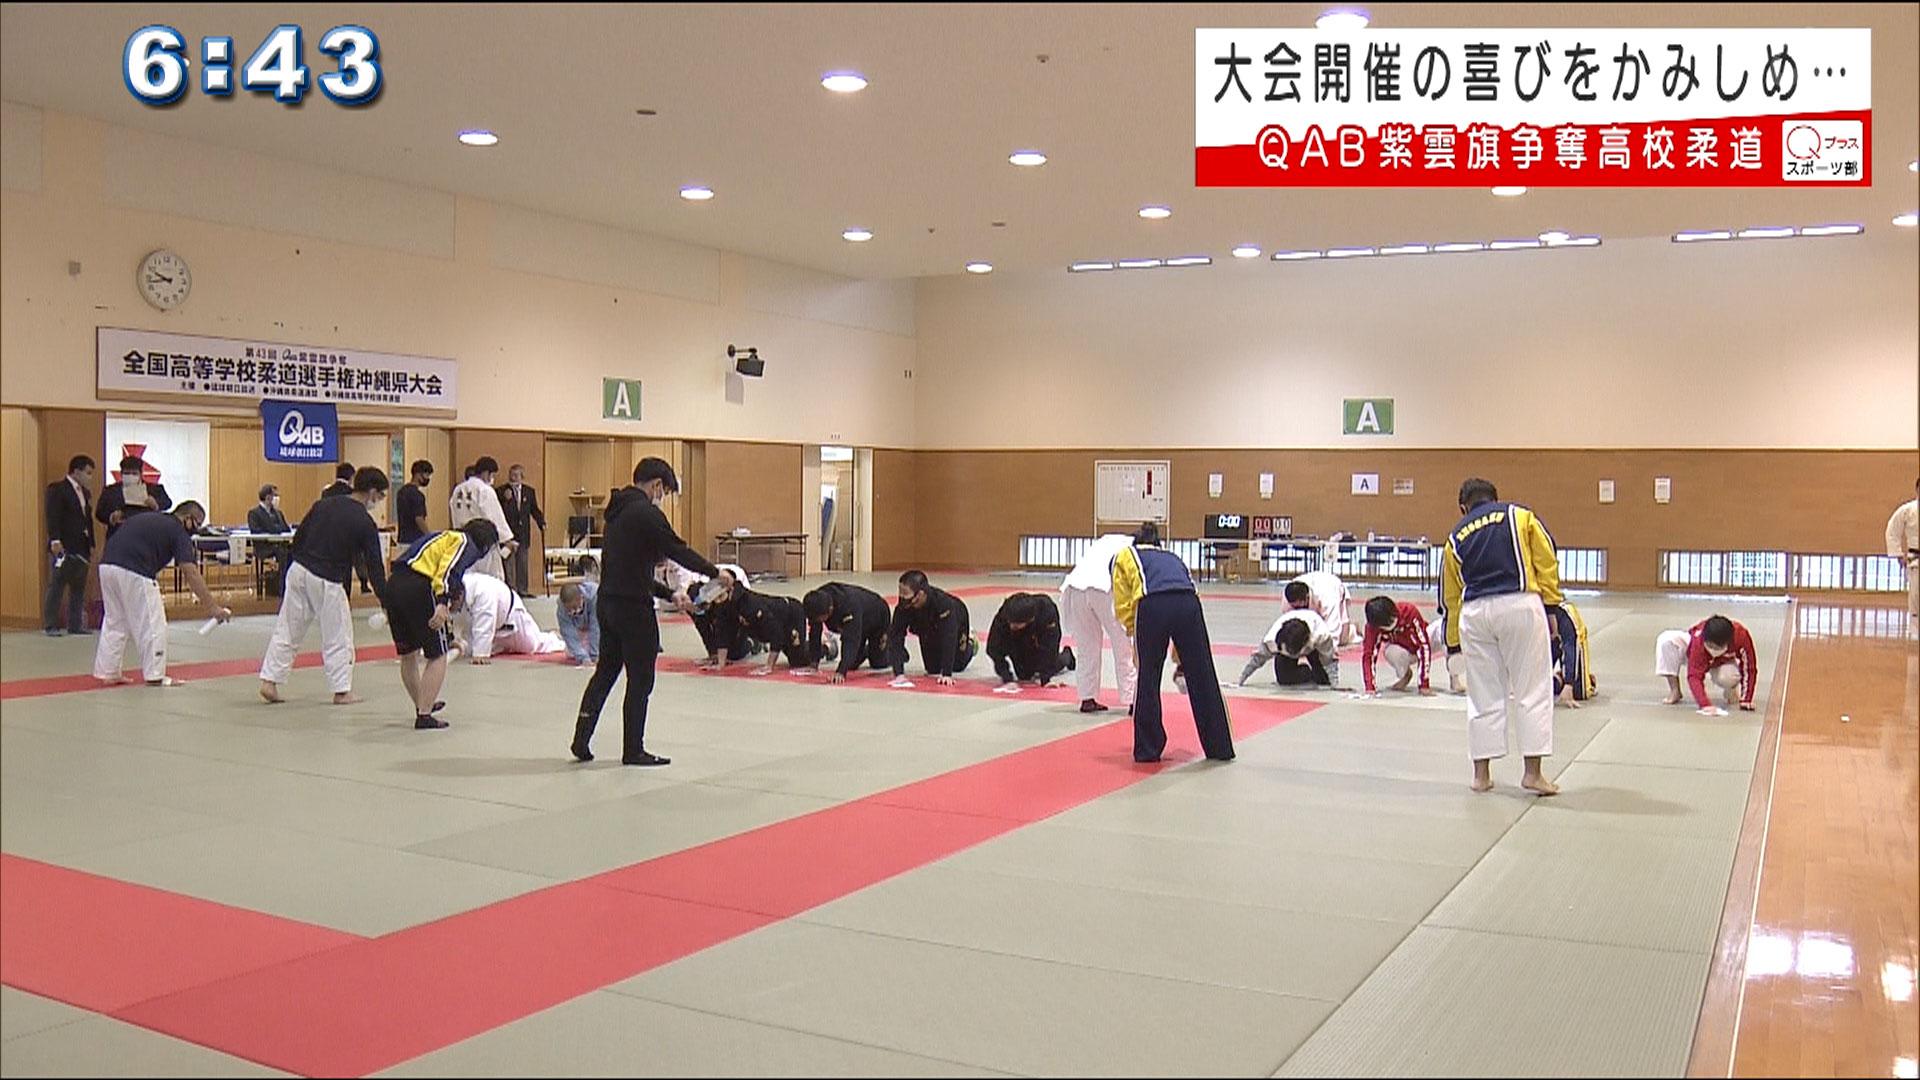 QAB紫雲旗争奪高校柔道大会 大会開催の喜びを感じて&沖尚の牙城を崩すのは